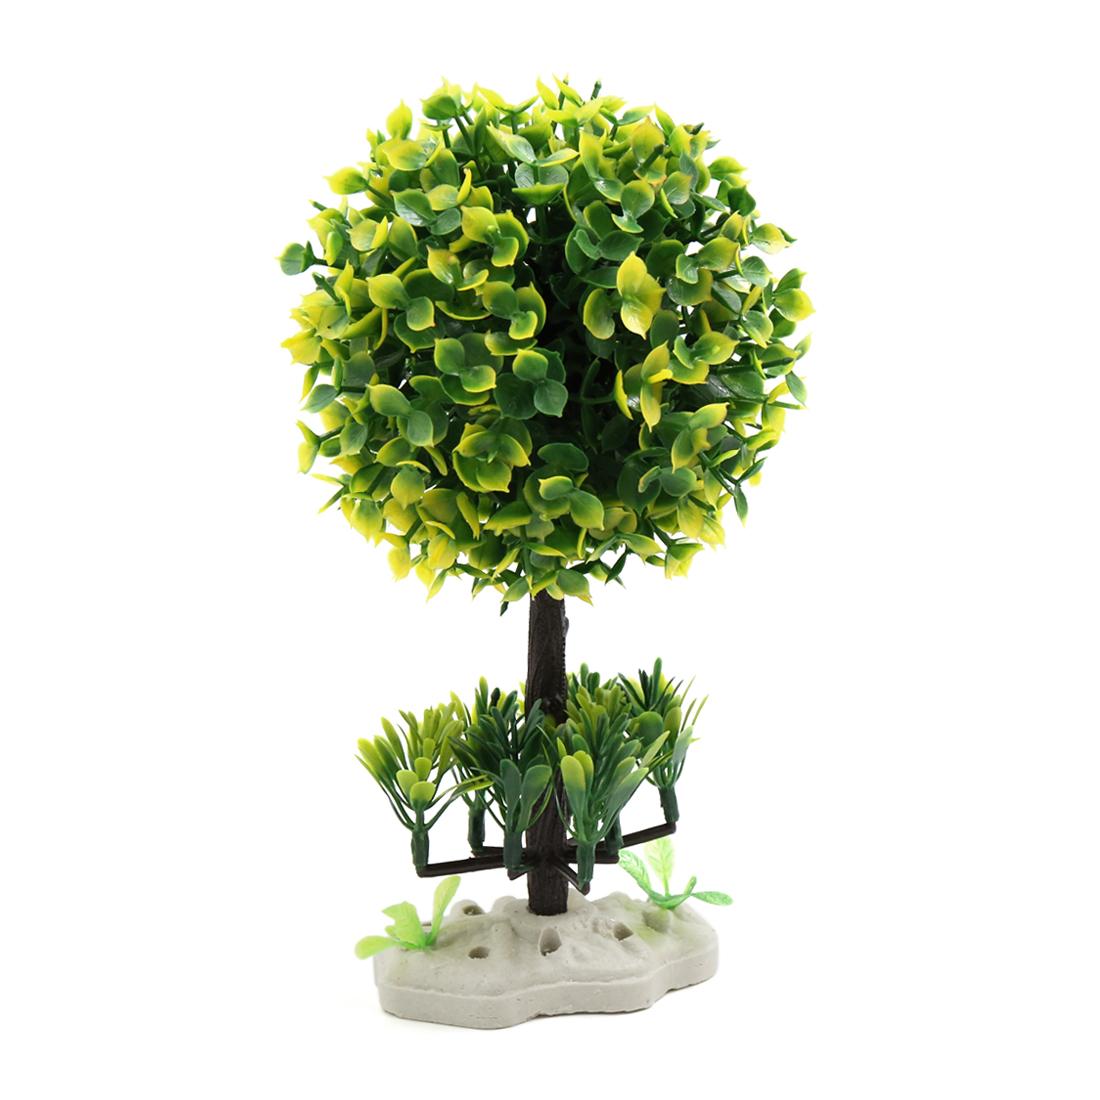 Yellow Green Plastic Leaves Tree Aquarium Landscape Decor Plant Ornament w Stand